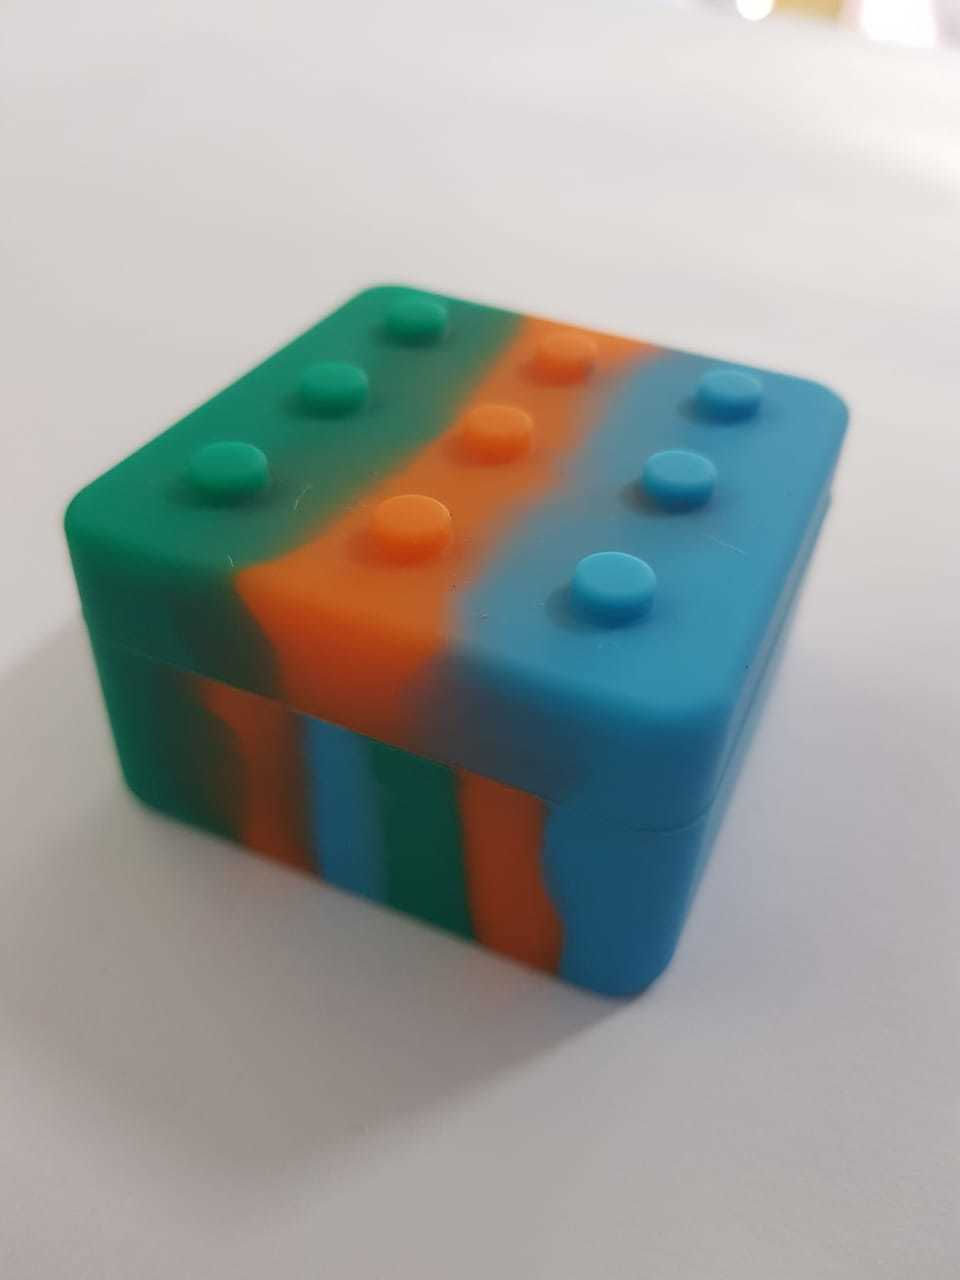 Slick Lego Medio 5 em 1 26ml